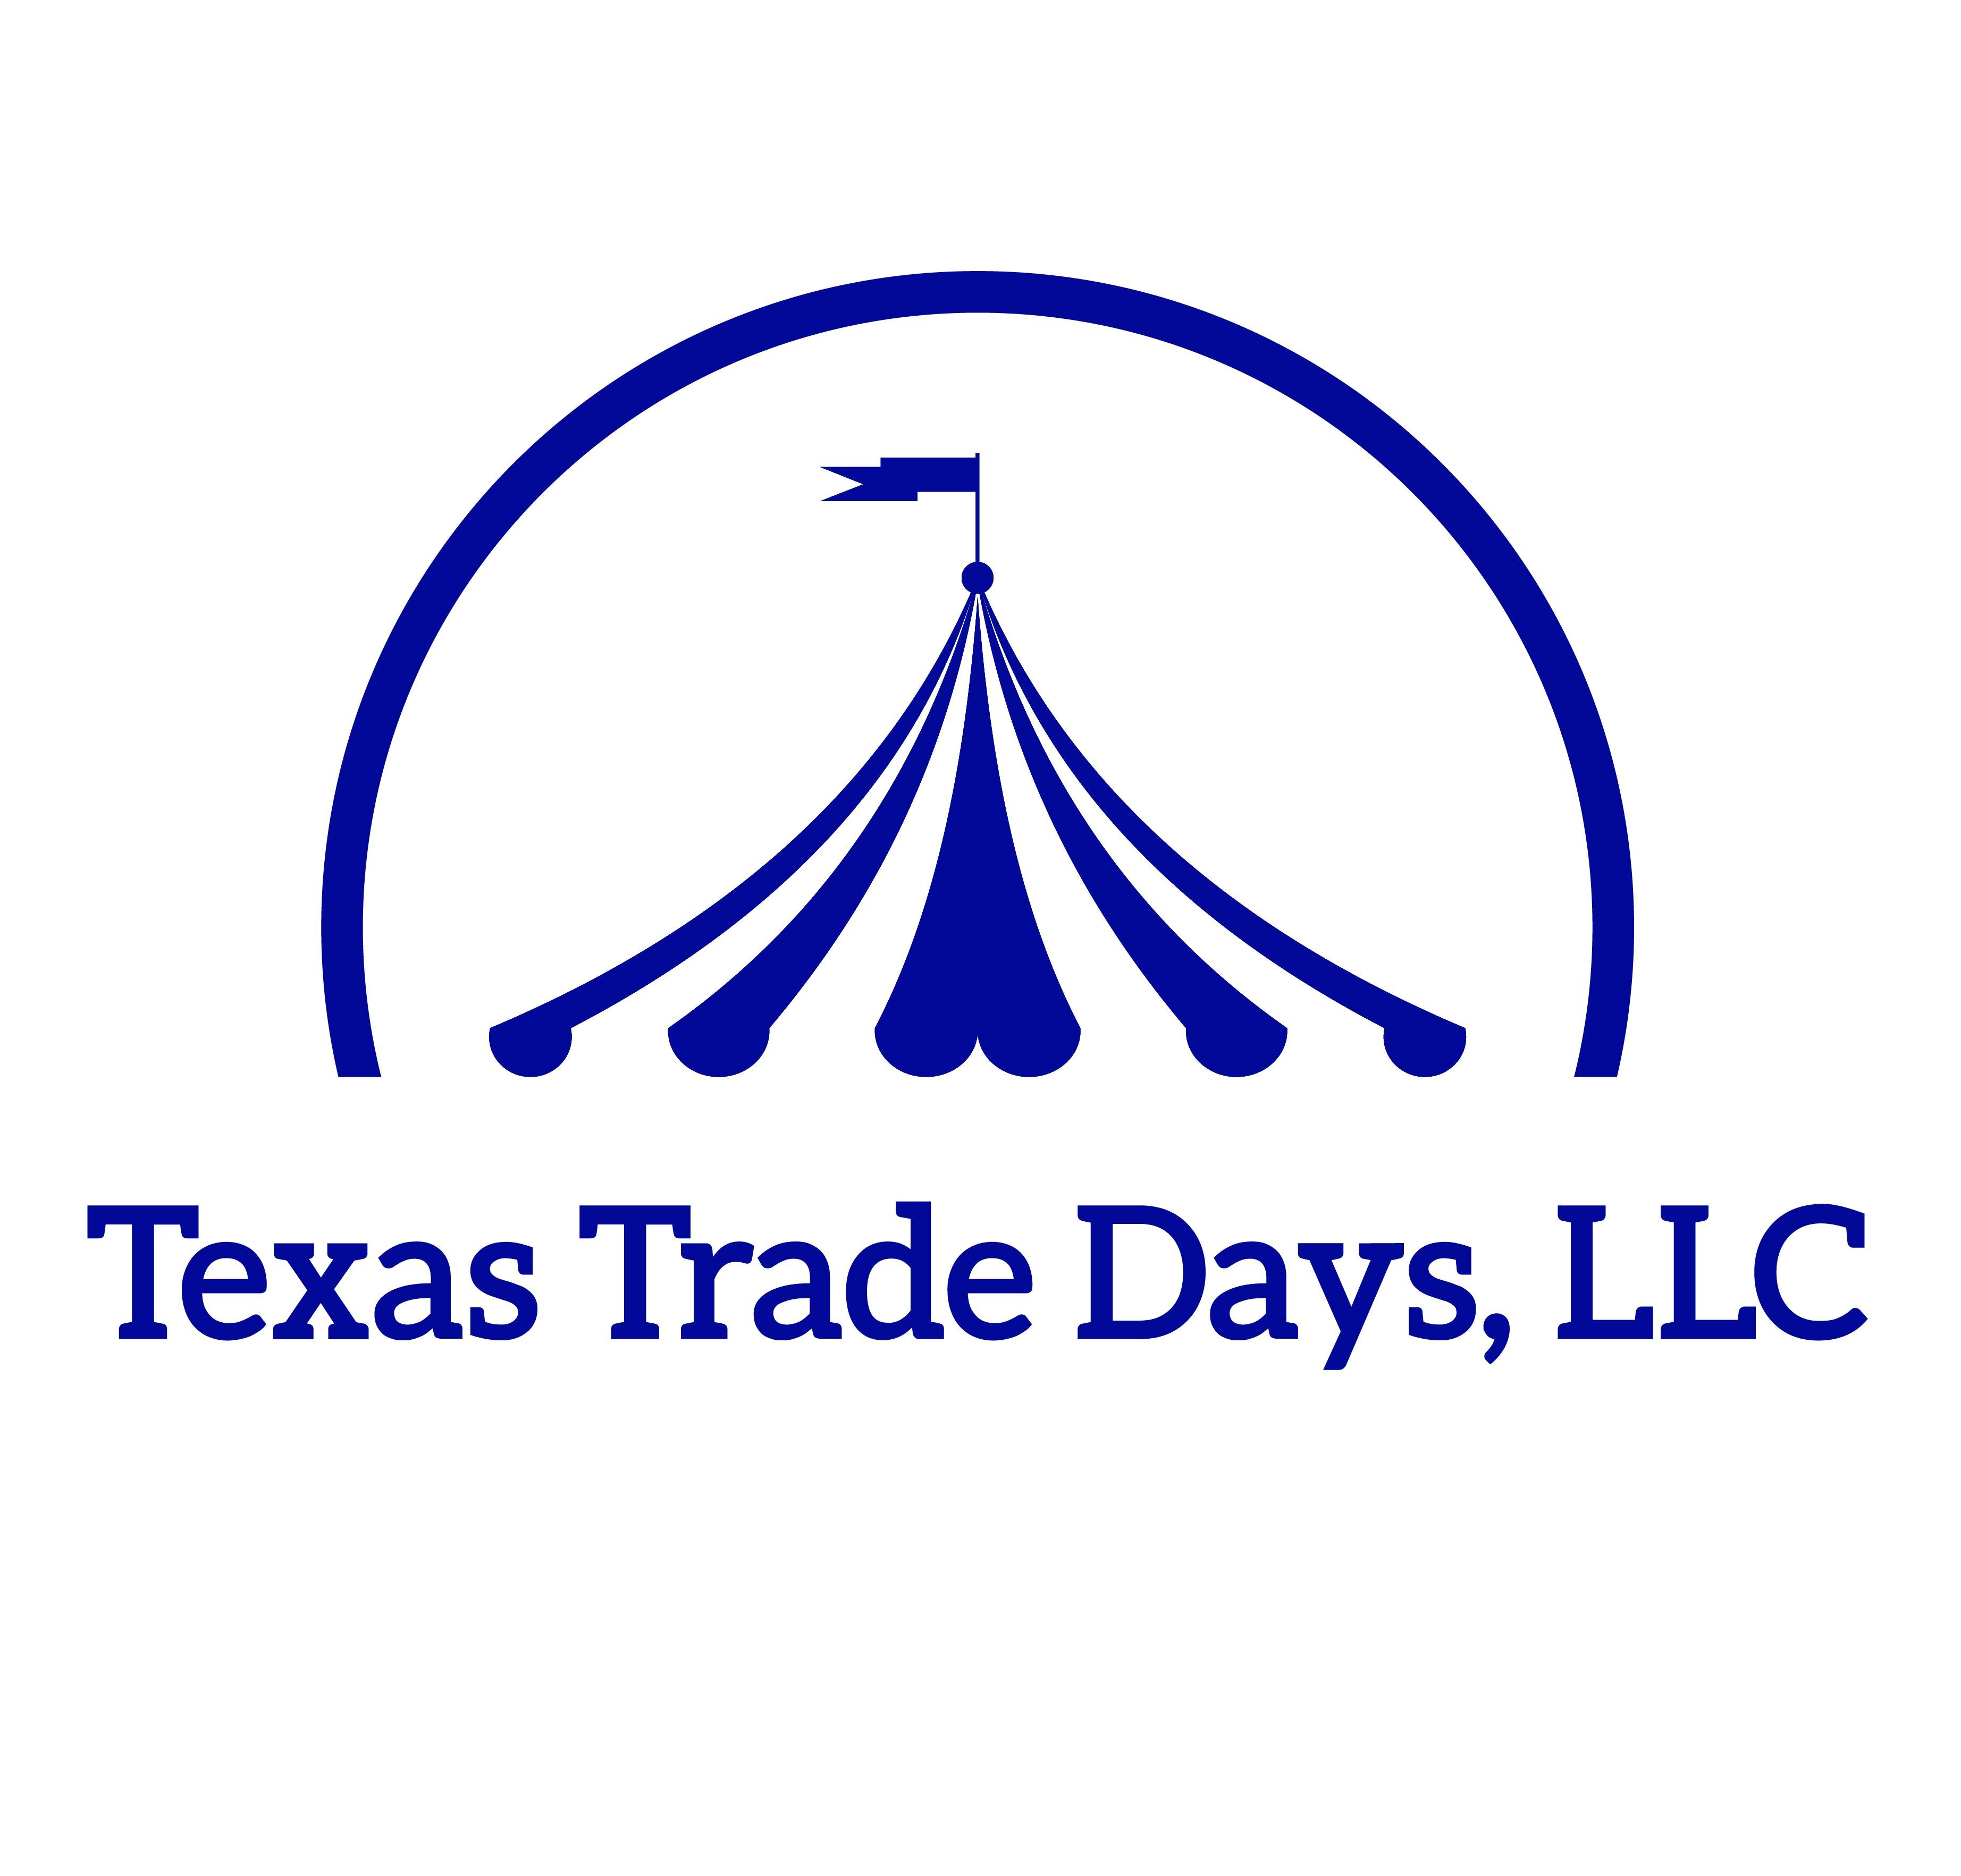 Texas Trade Days, LLC